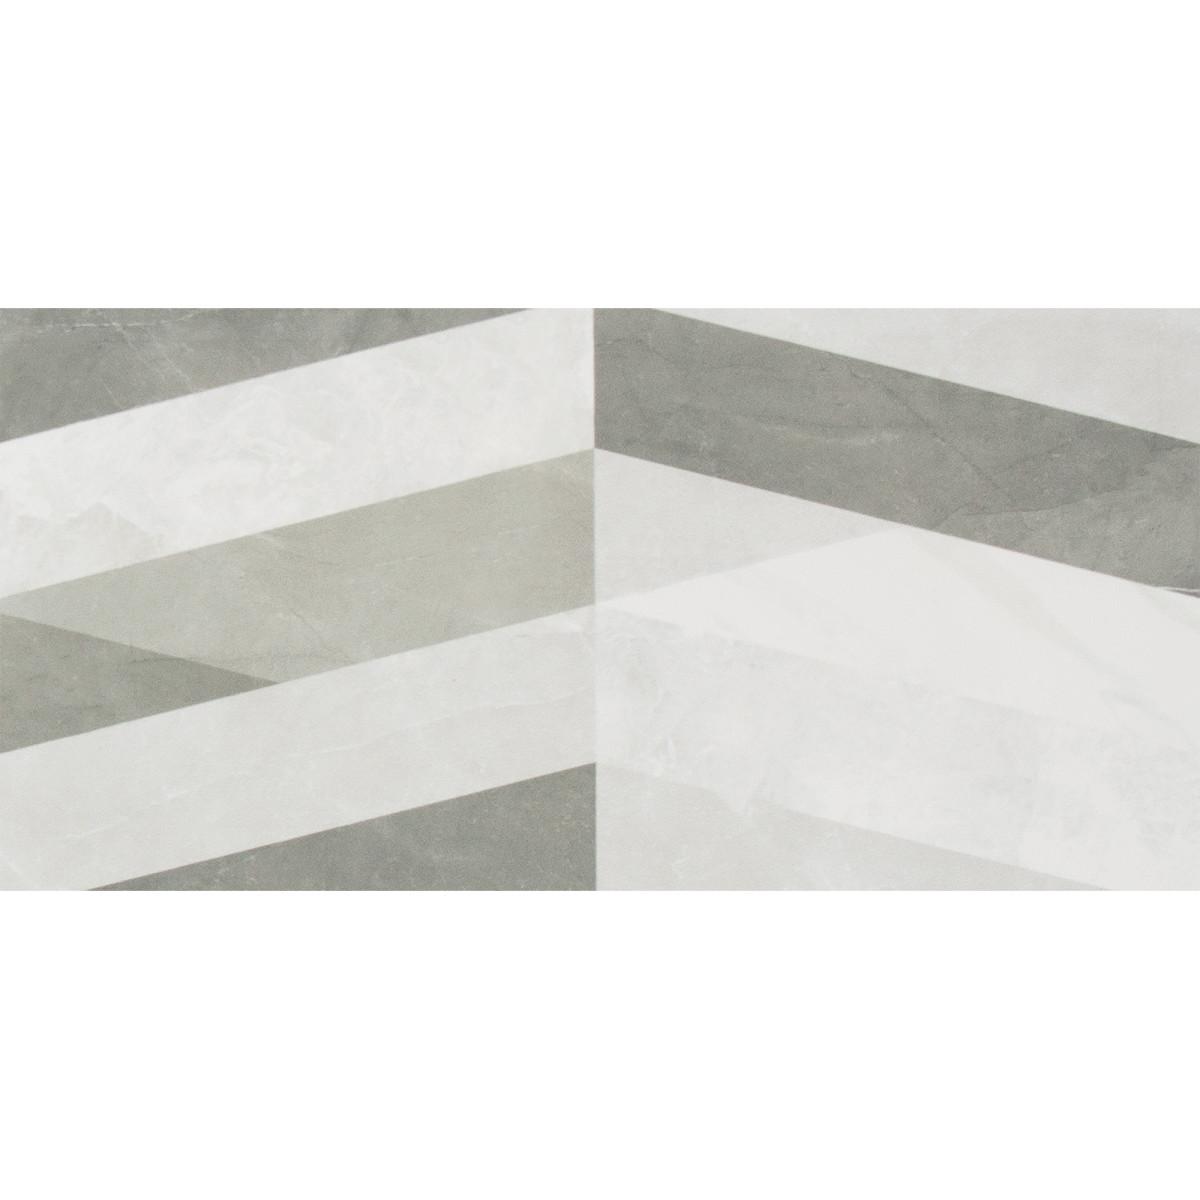 Плитка настенная Savoy мозаика 20х40 см 1.2 м² цвет серый